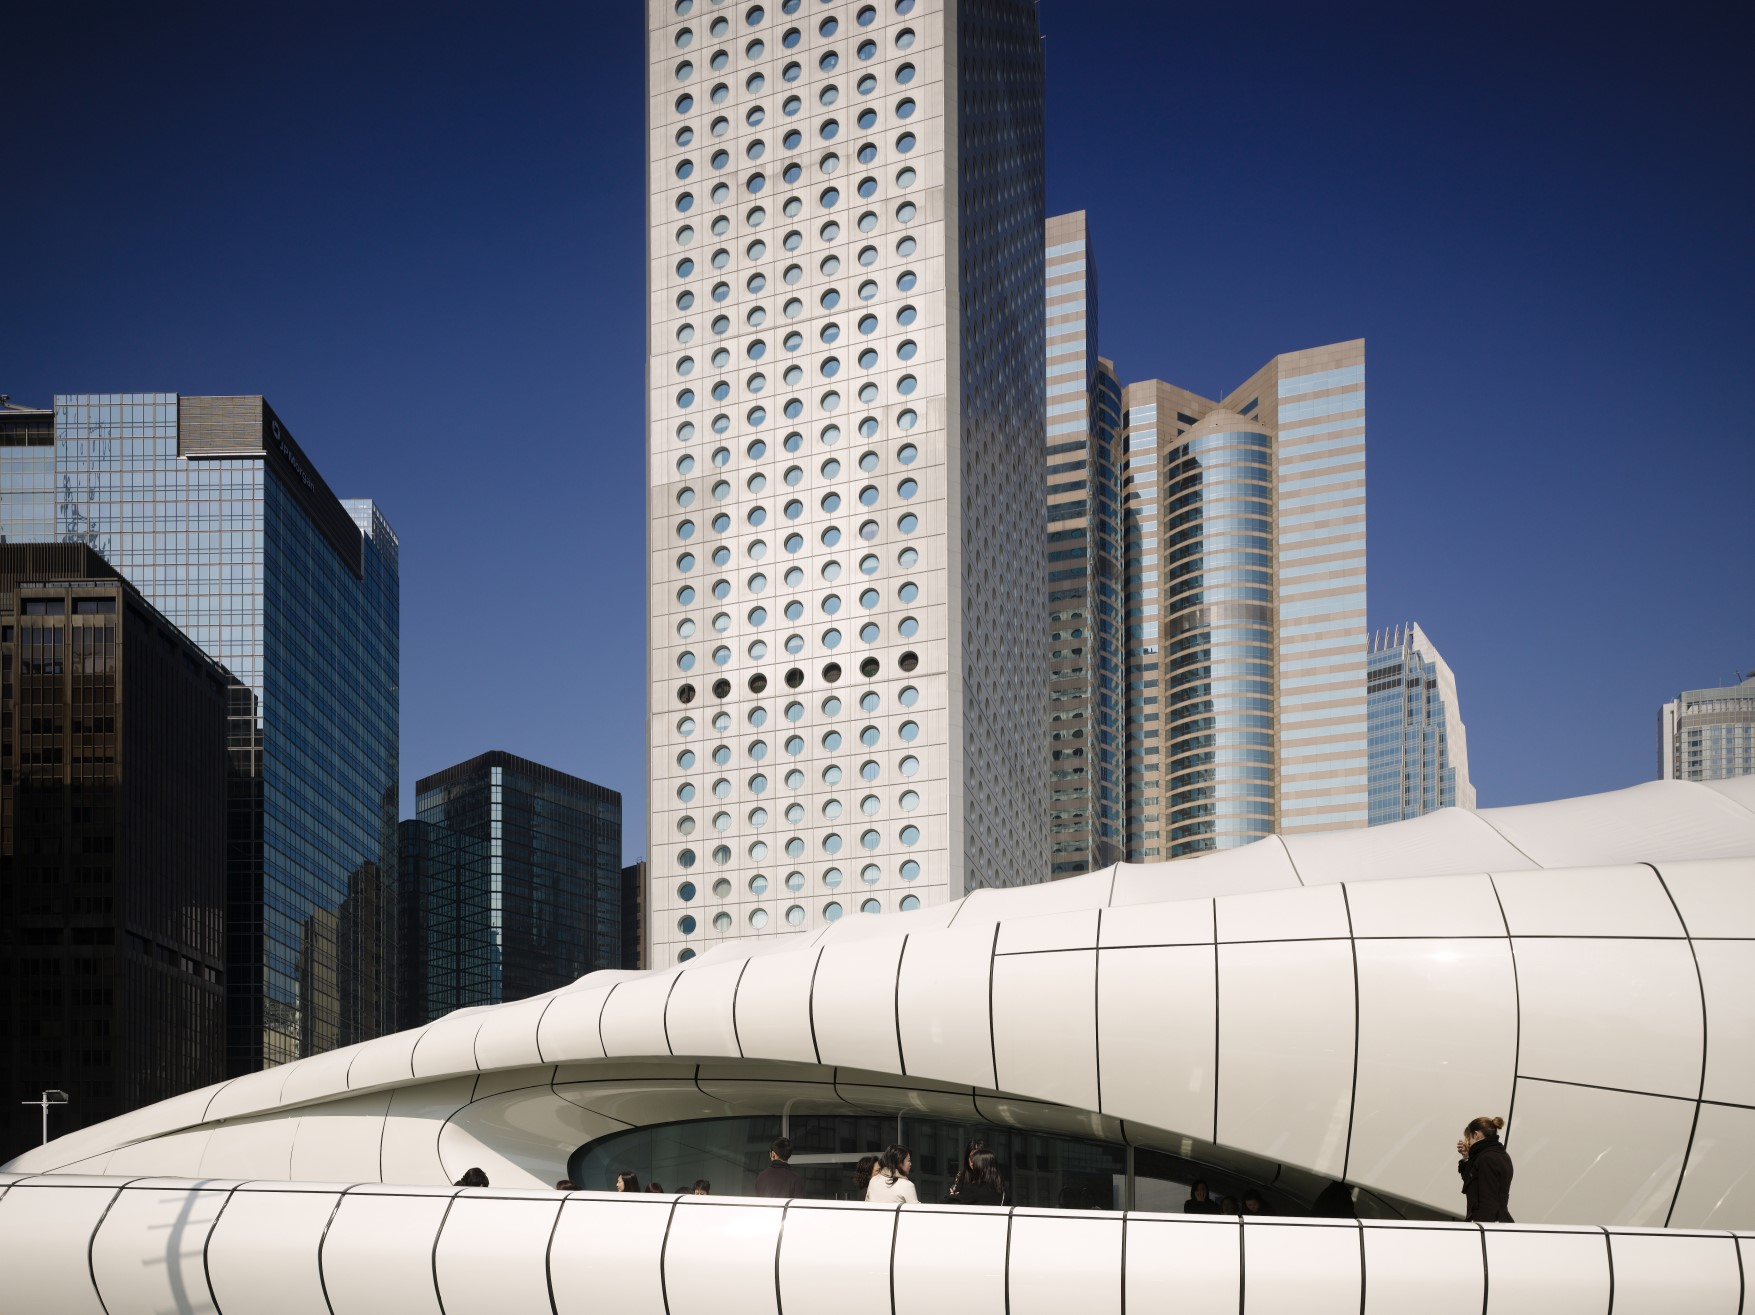 Channel (Hong Kong) Zaha Hadid Architects- Fotografía Virgile Simon y Marc Gerritsen